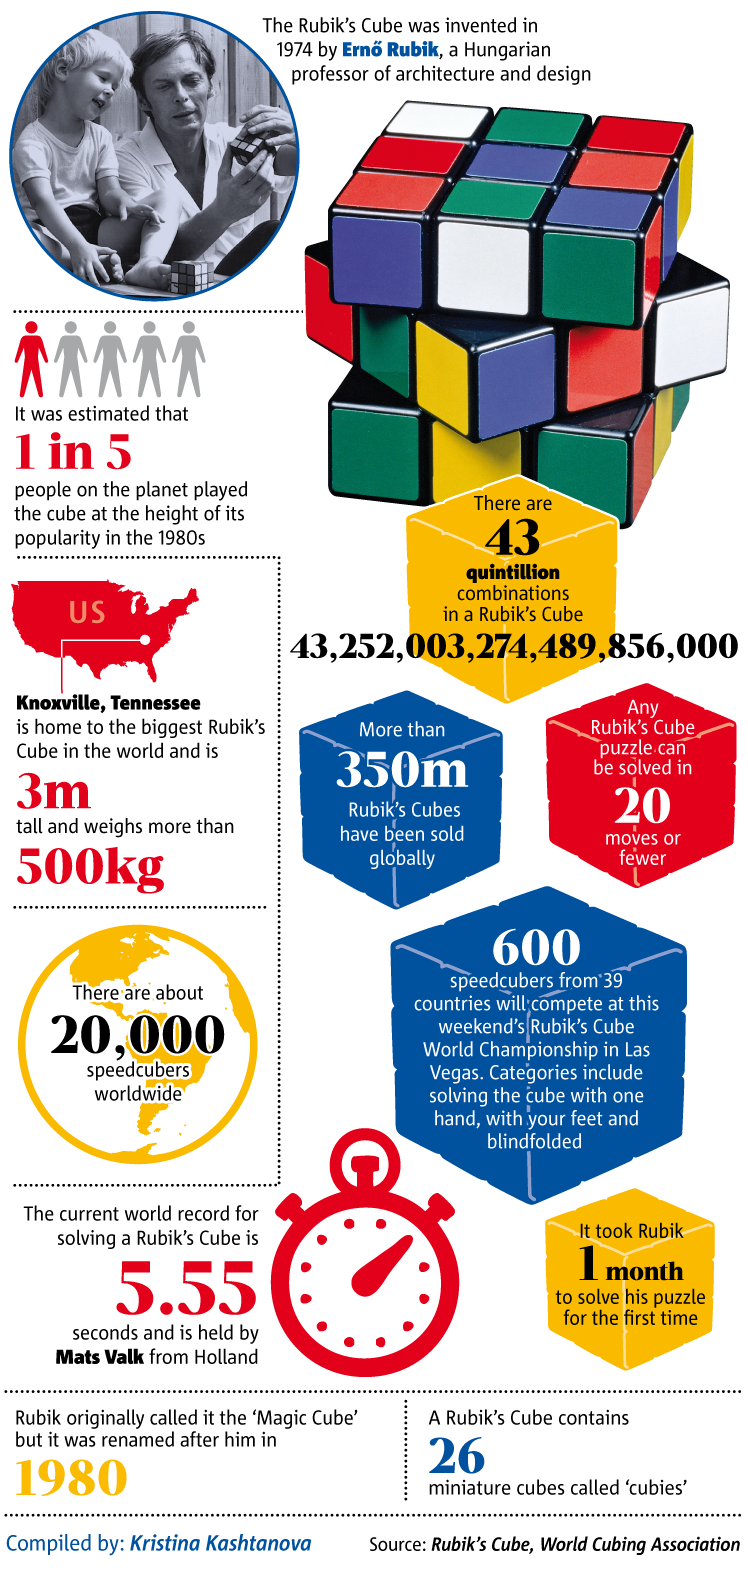 История кубика Рубика в картинках цифры и факты